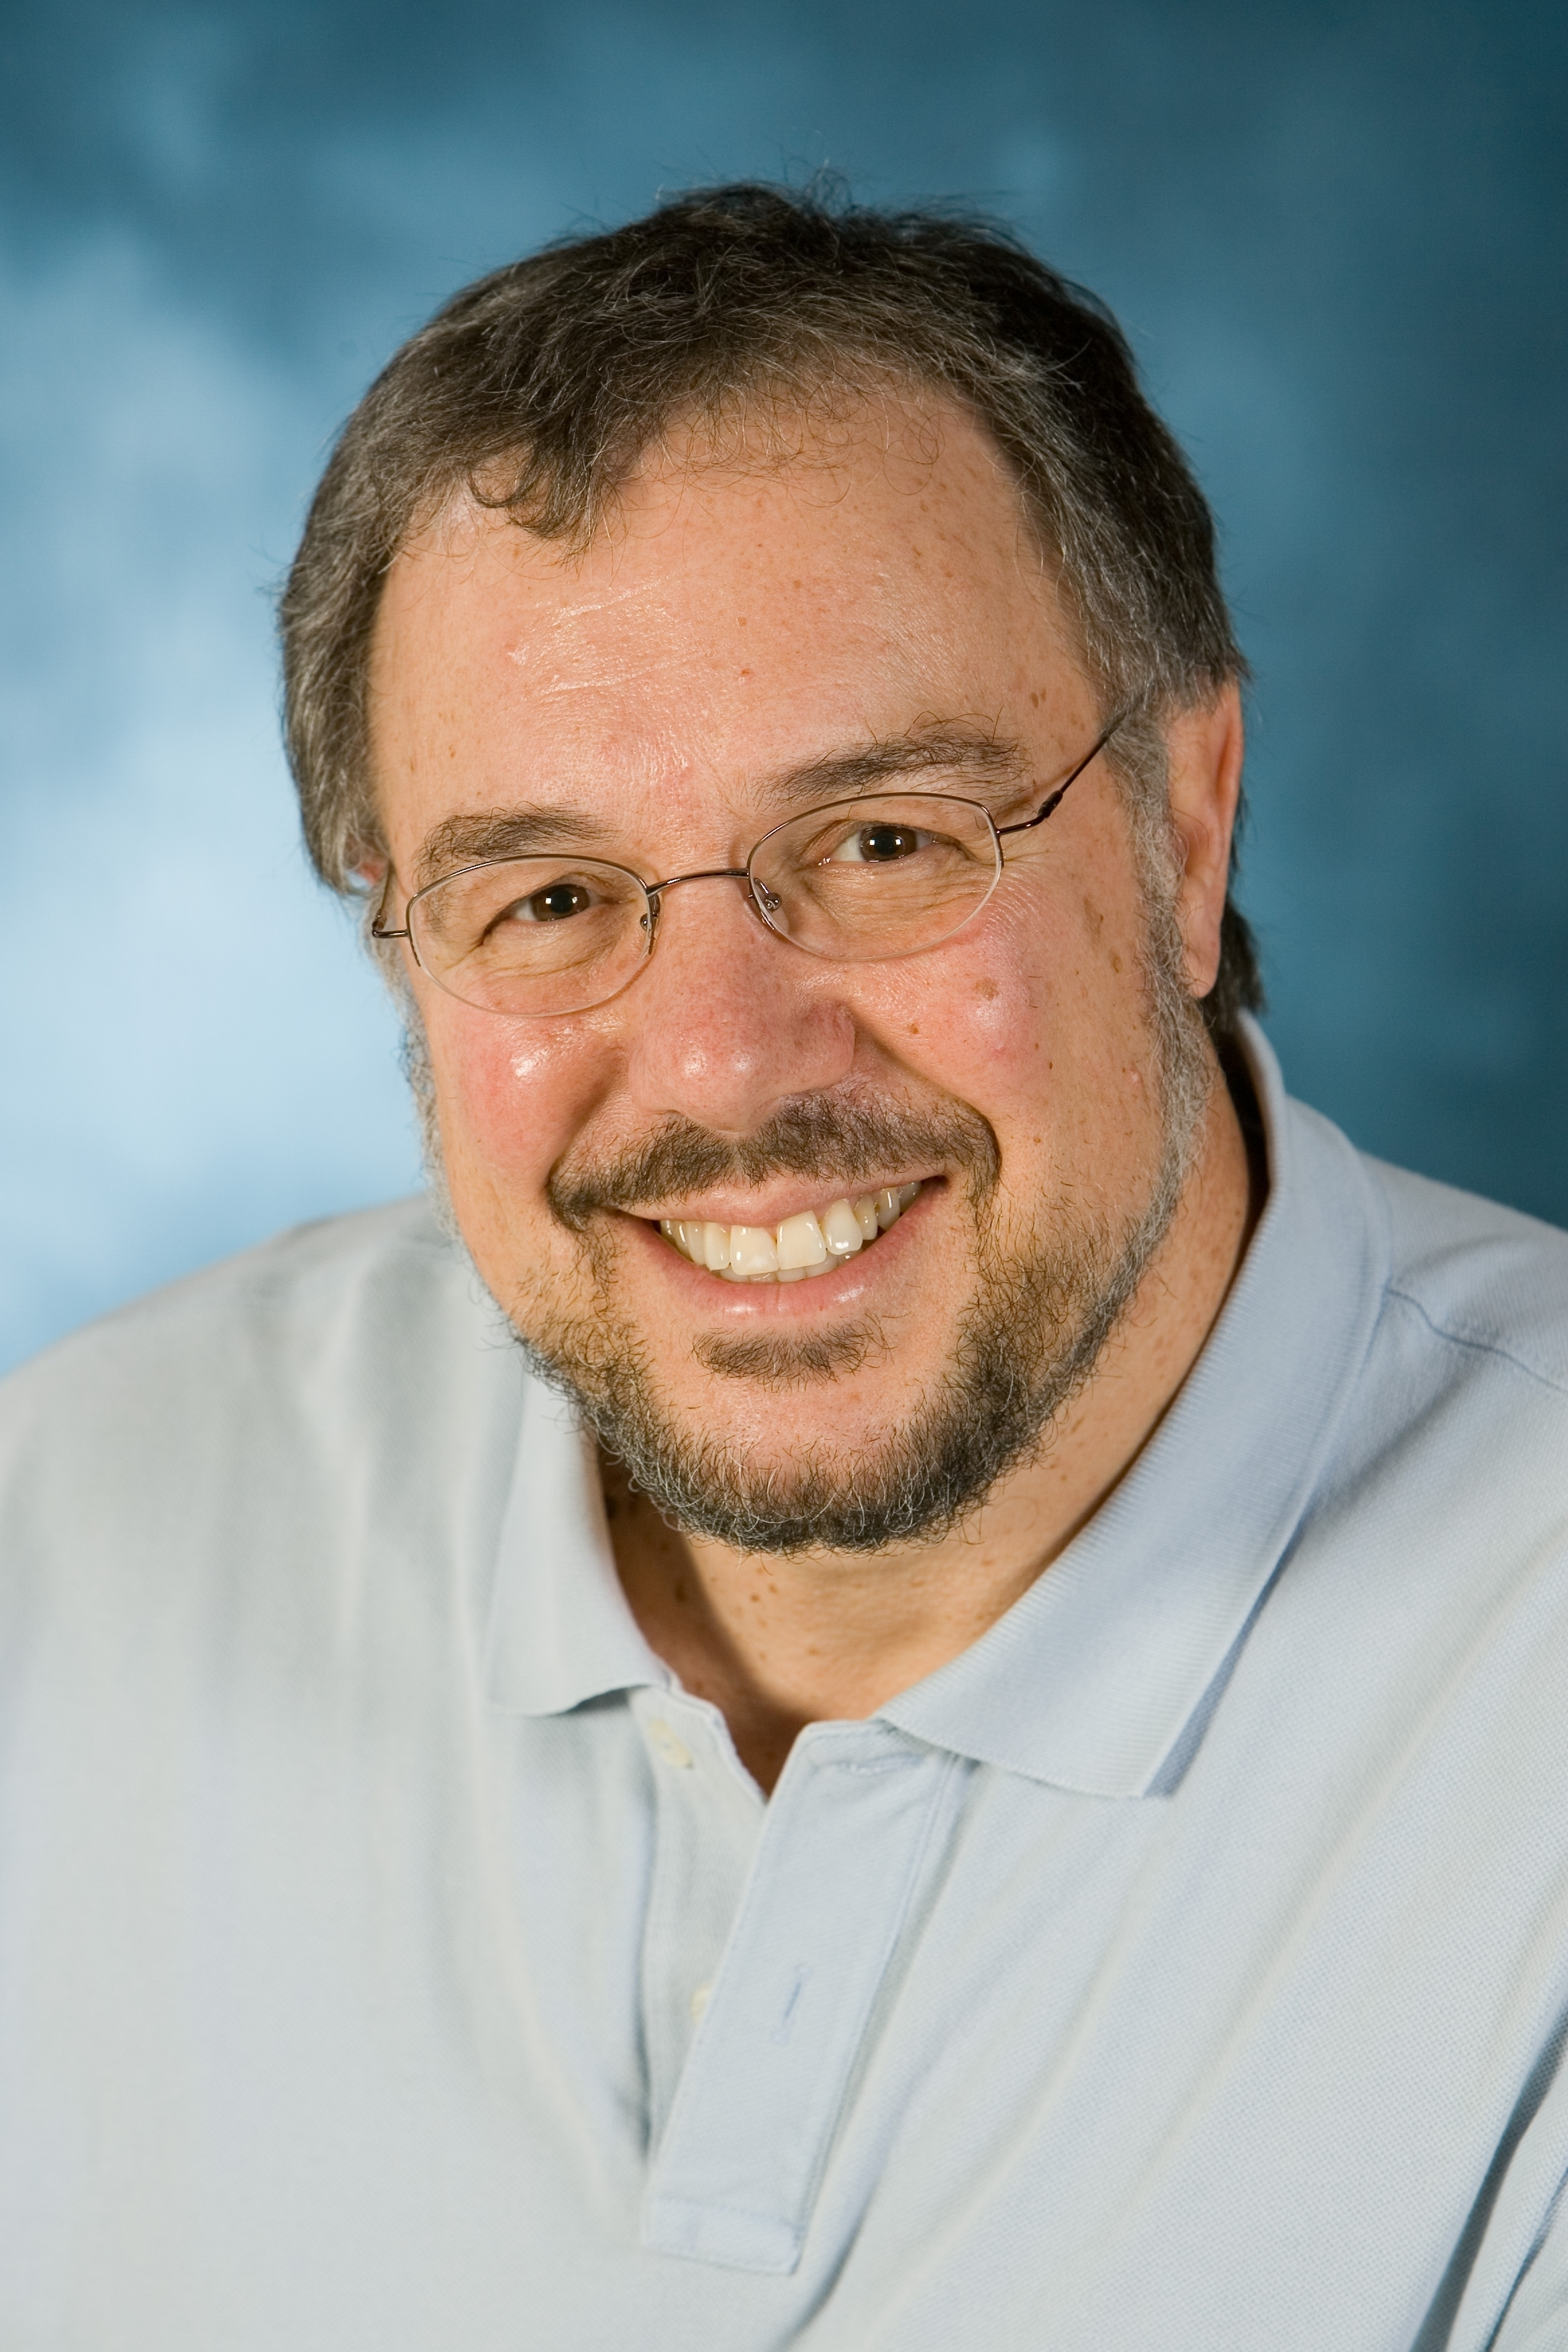 Donald Scavia, director of U-M's Graham Sustainability Institute. Photo courtesy of Donald Scavia